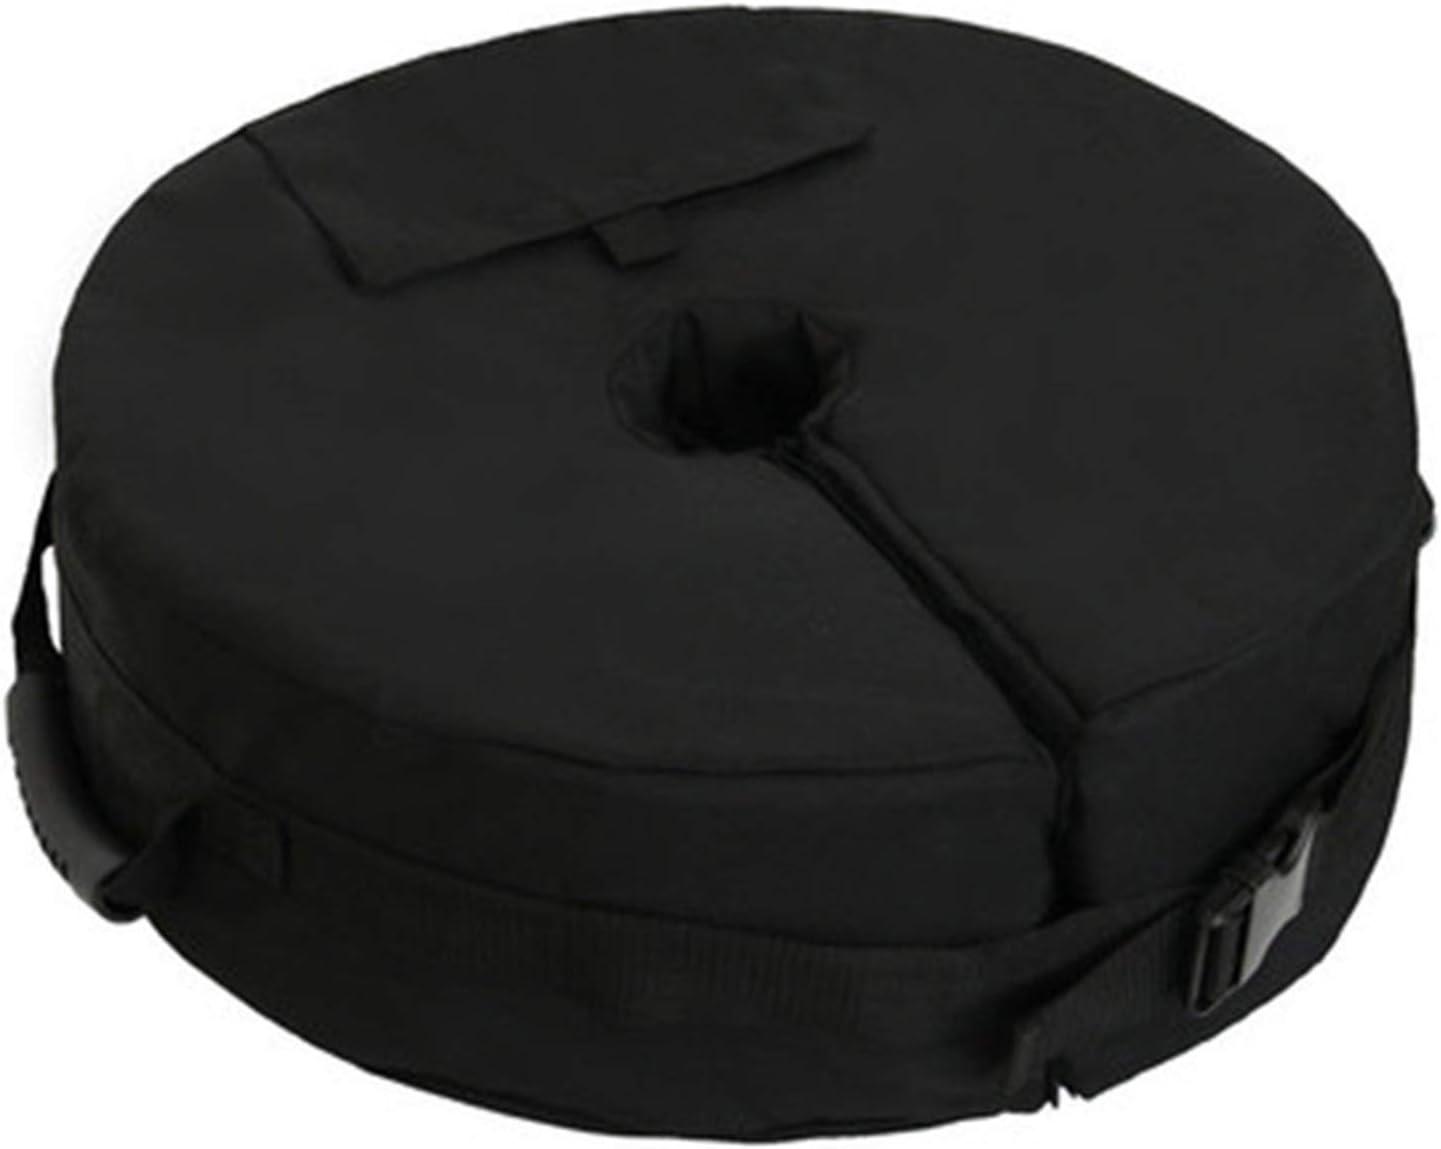 YXIUER Hot Umbrella Reservation Base Weight Weatherproof Boston Mall Detachable Bag Umbr